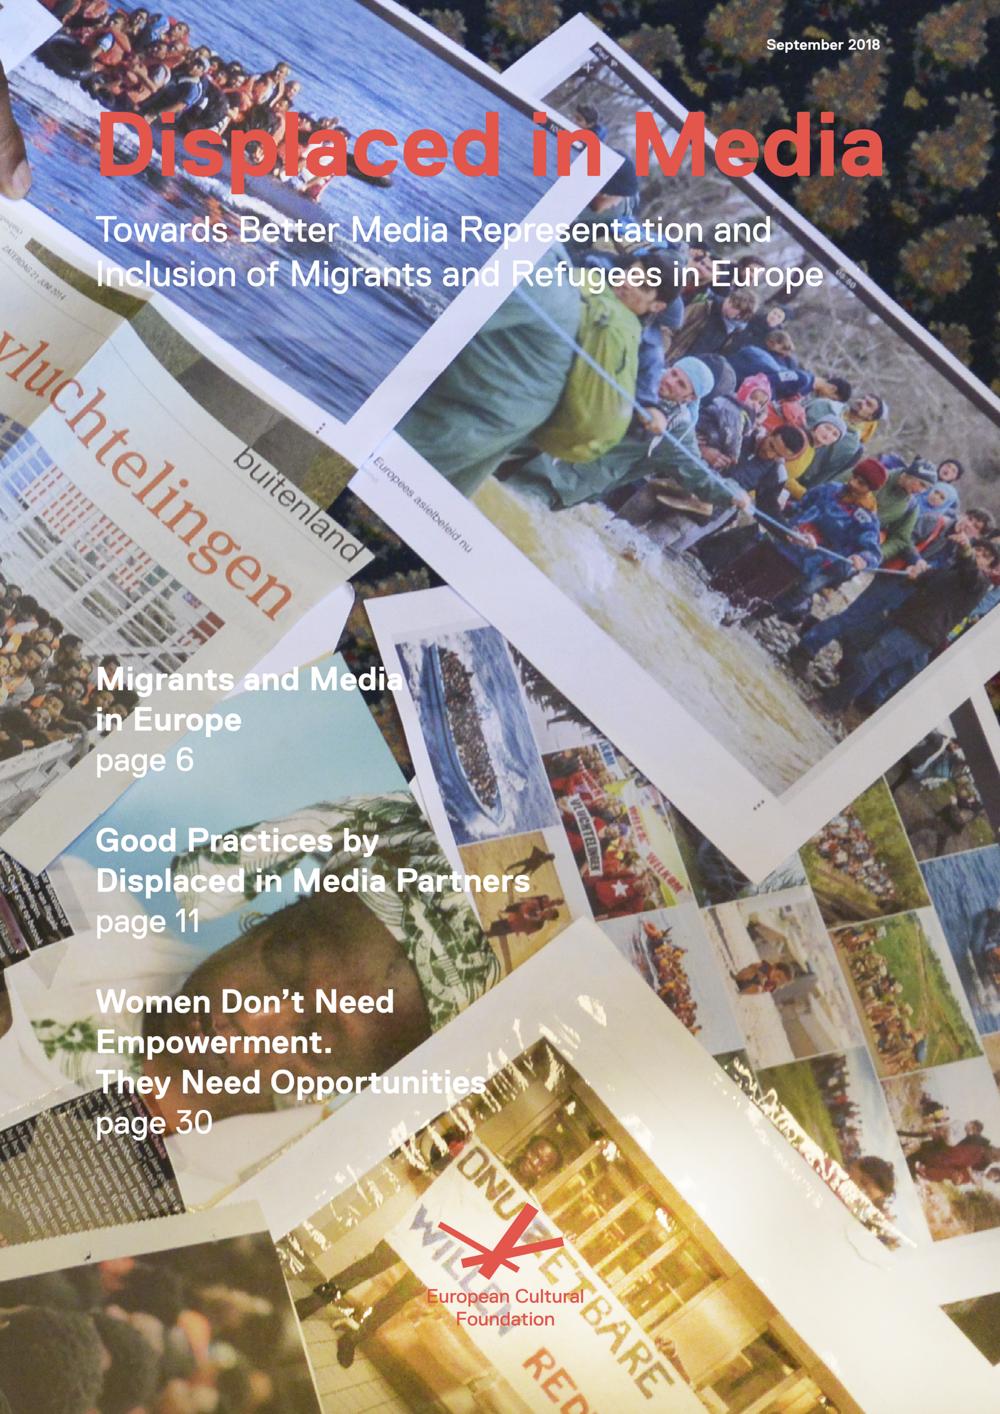 ECF-Magazine-displaced-in-media_v018_FIN2000.png